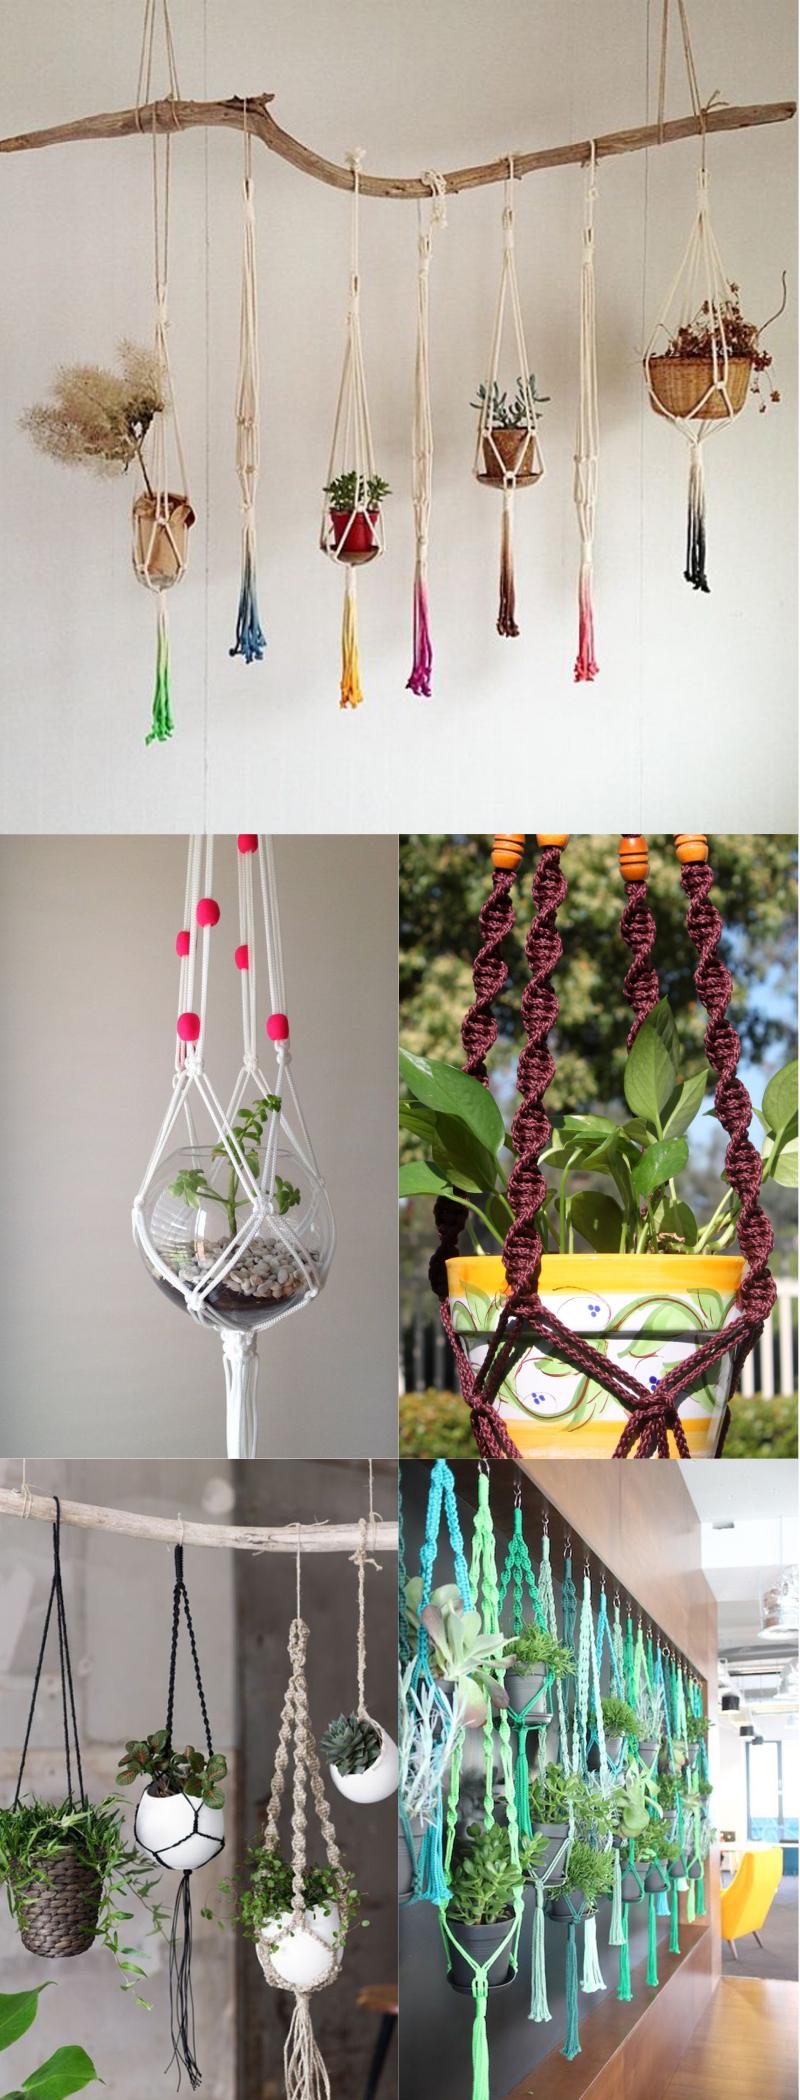 Diy Macram Plant Hanger Ideas That Will Beautify Your